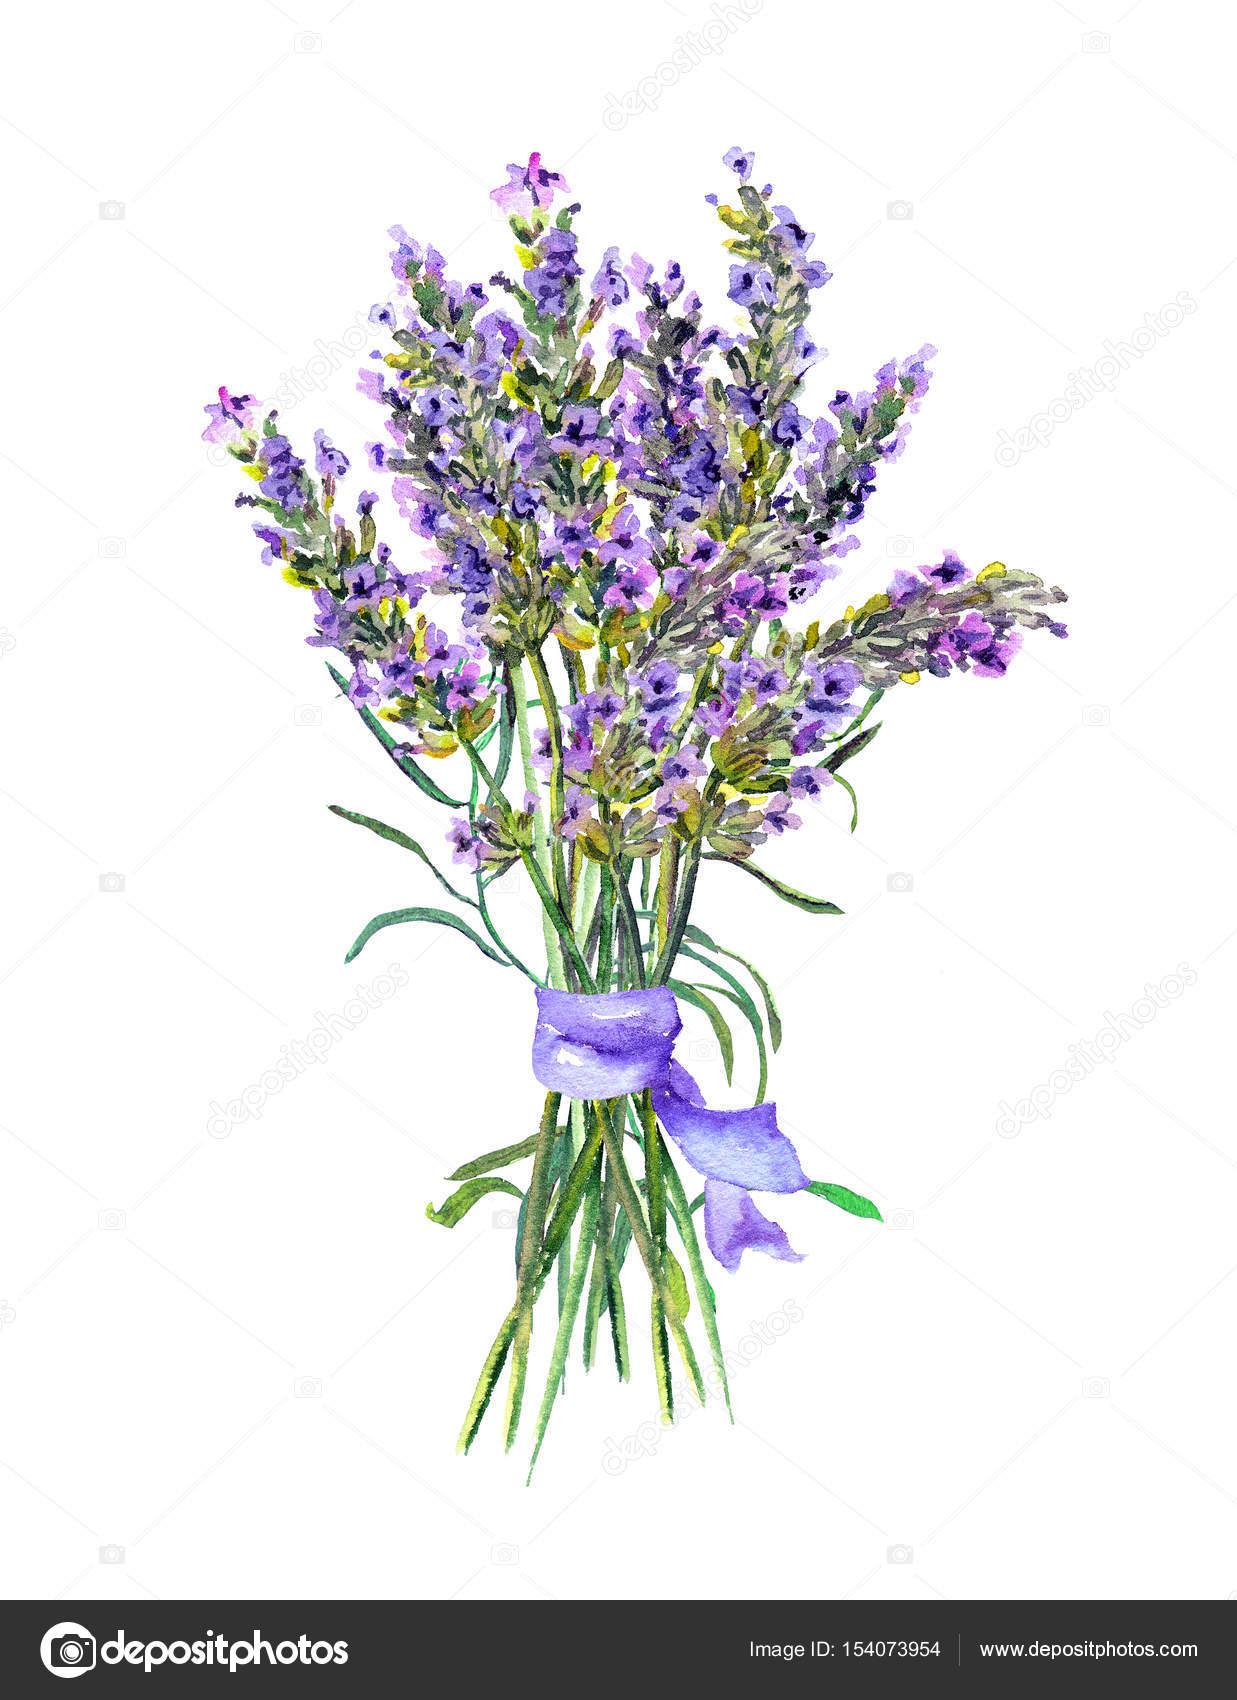 Lavender Flowers Bunch Watercolor Stock Photo Image By C Zzzorikk 154073954